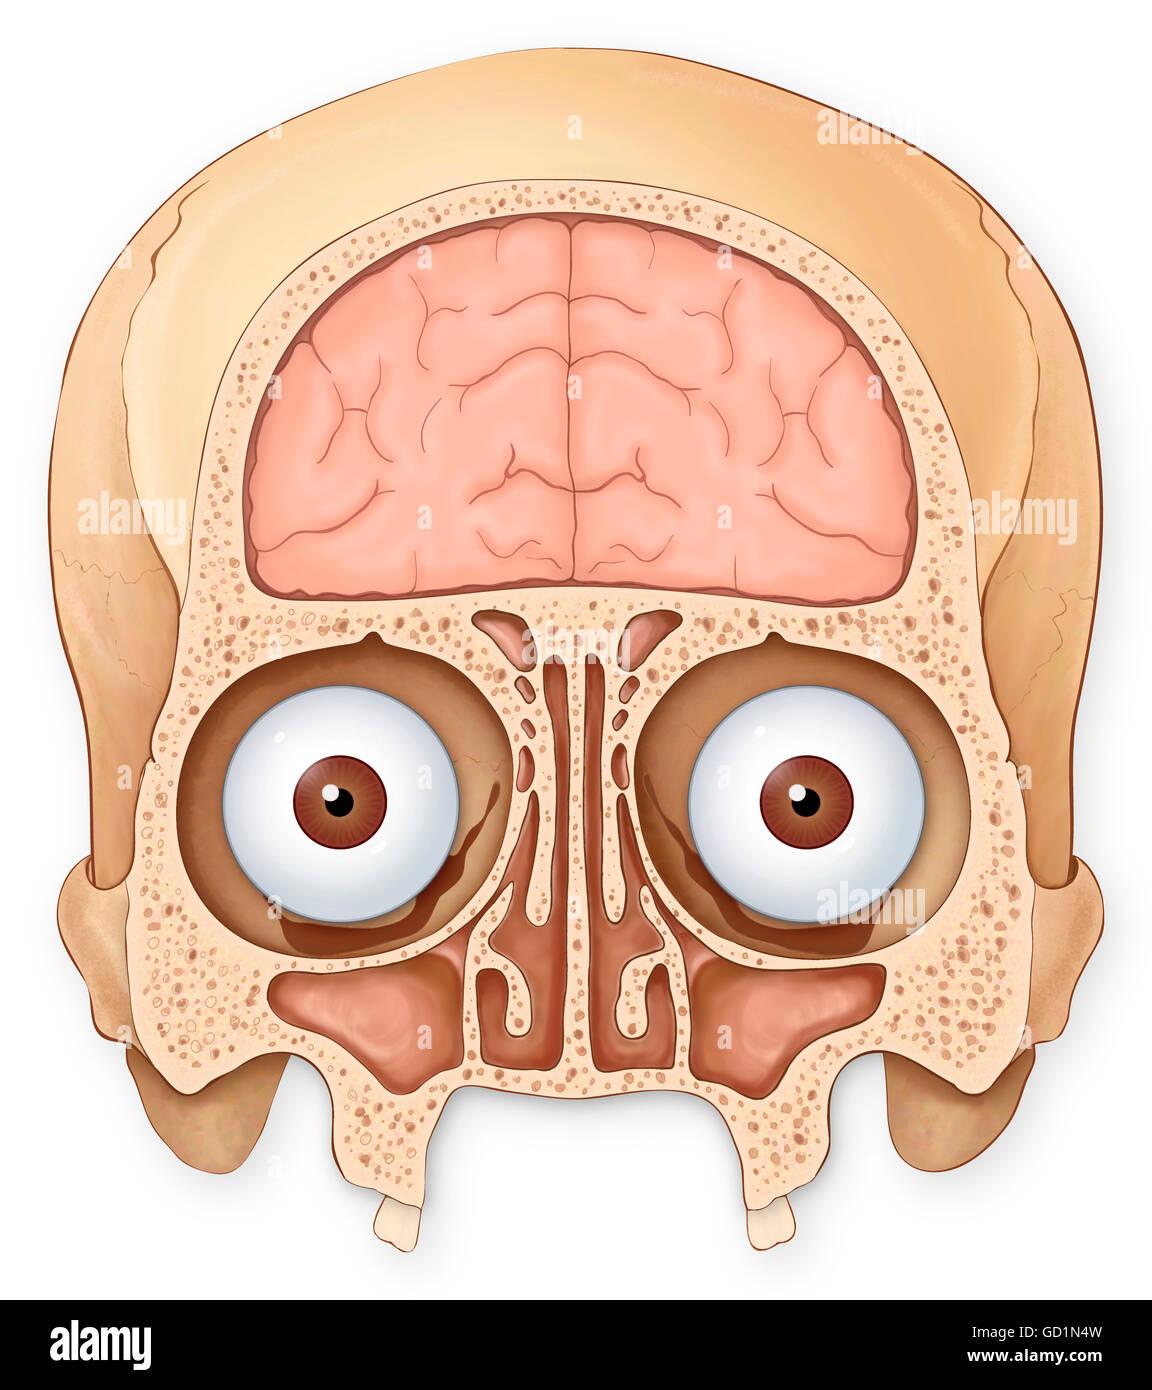 Brain Frontal Section Stockfotos & Brain Frontal Section Bilder - Alamy